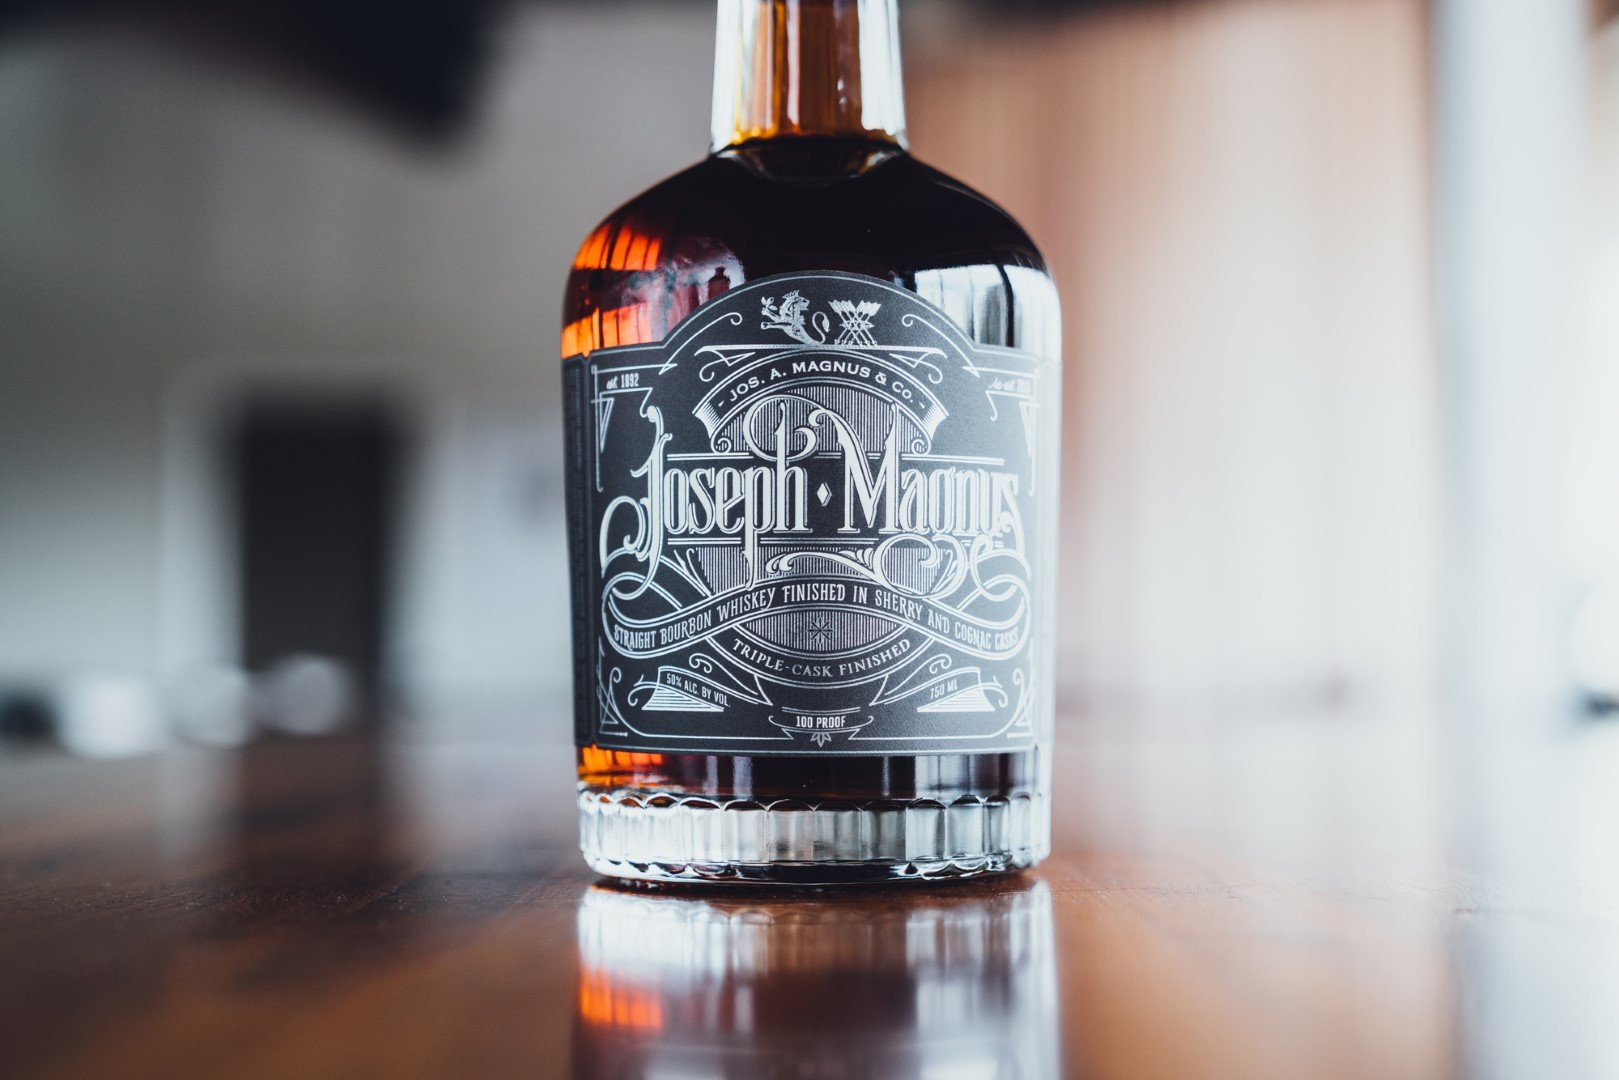 Joseph Magnus Straight Bourbon Whiskey (2019)